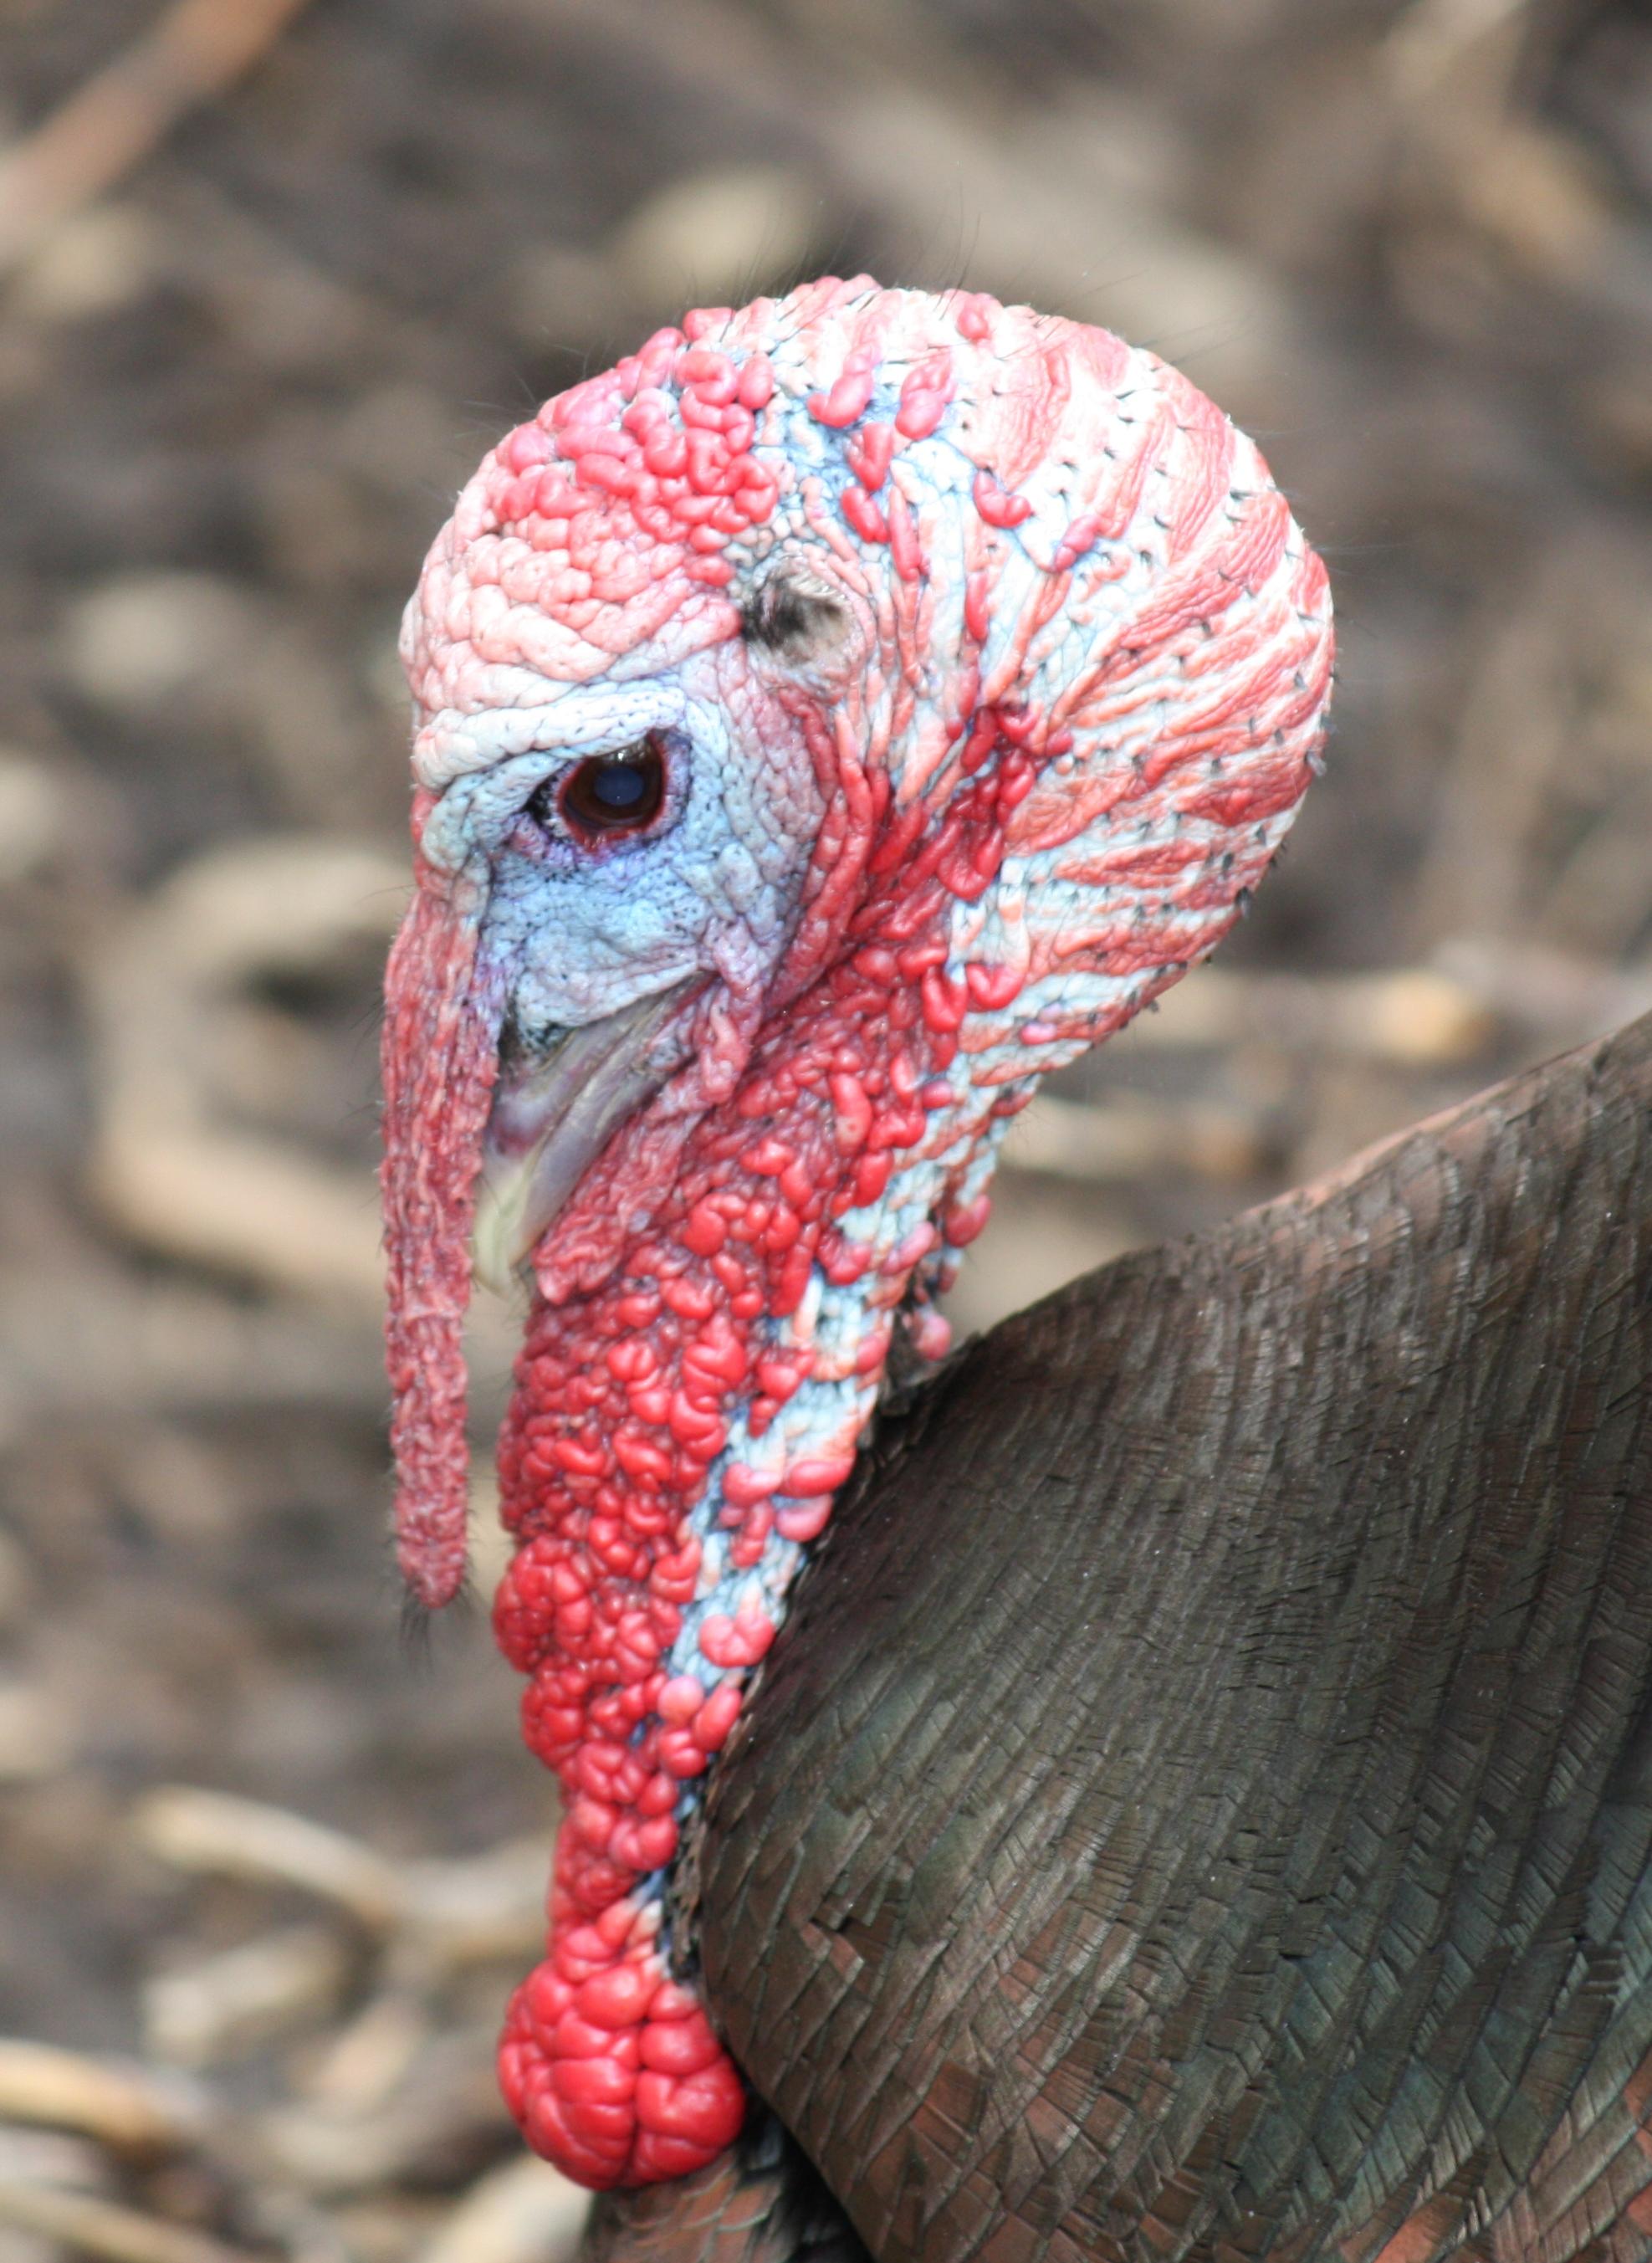 Wild Turkey Appearance